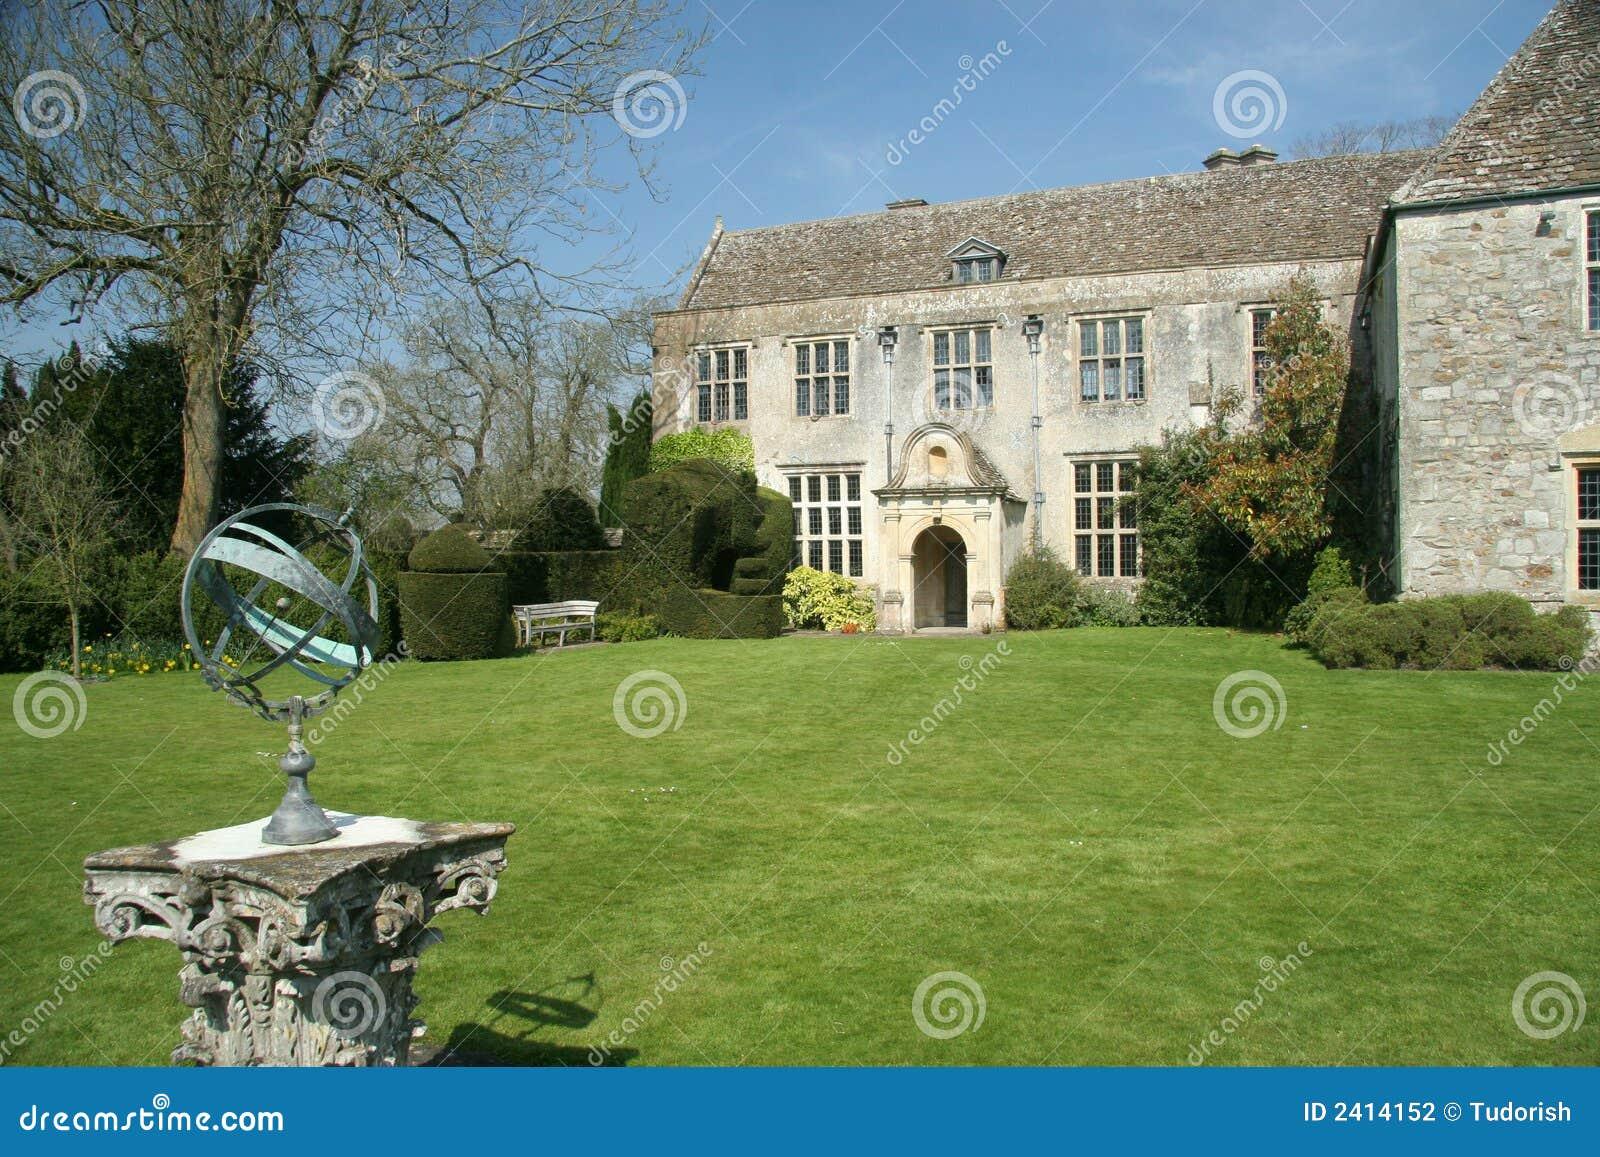 Casa di campagna inglese fotografia stock immagine 2414152 for Design di casa di campagna inglese